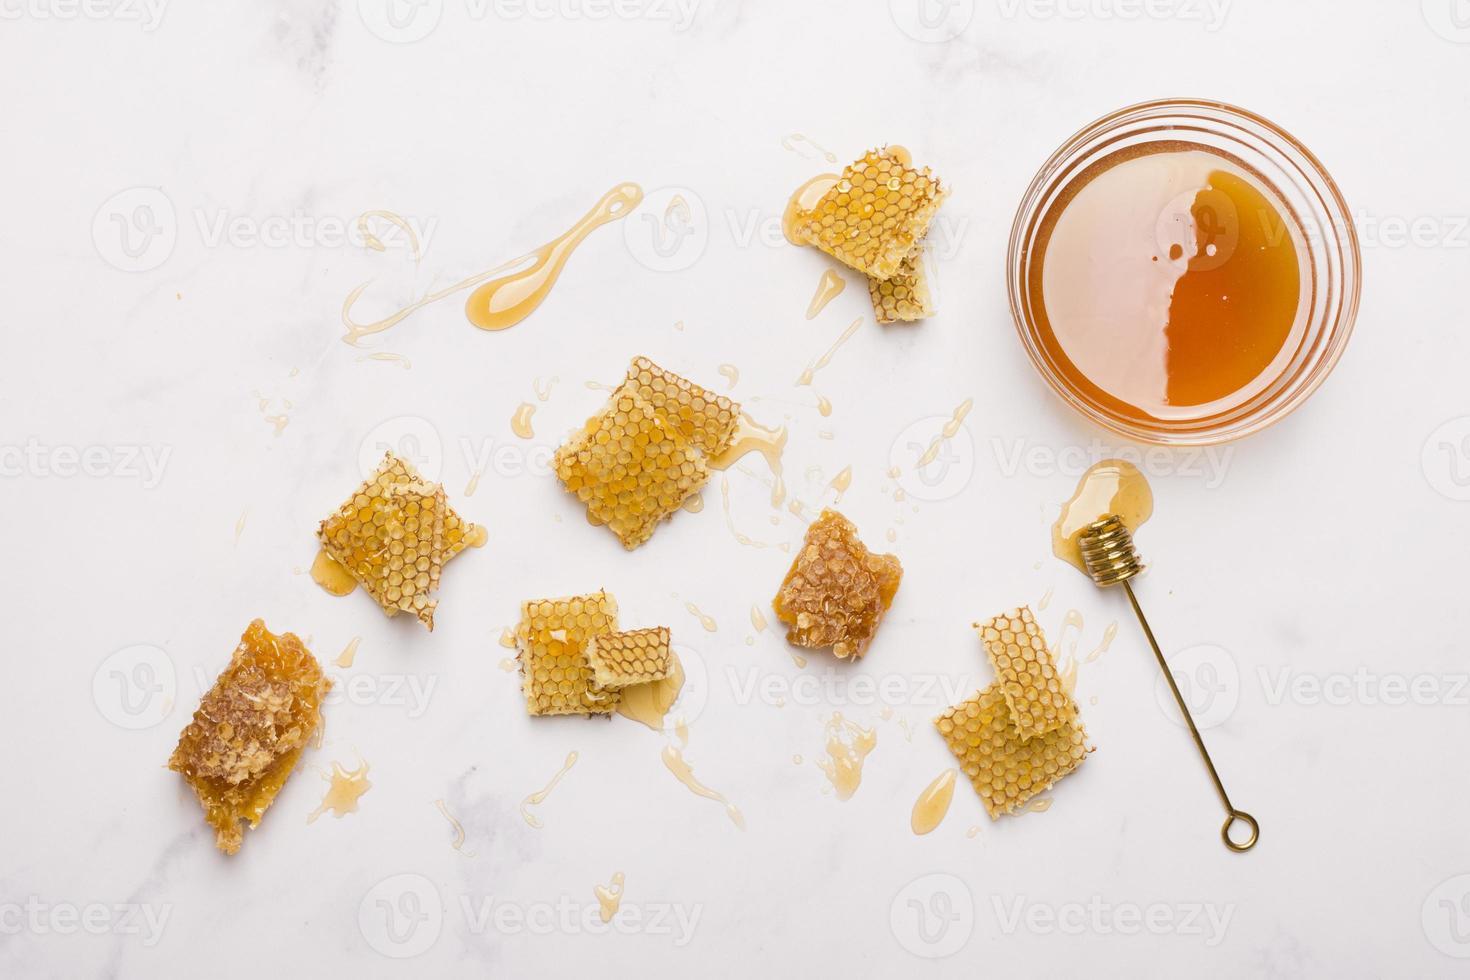 glasburk full honung med honungssked på vit bakgrund foto